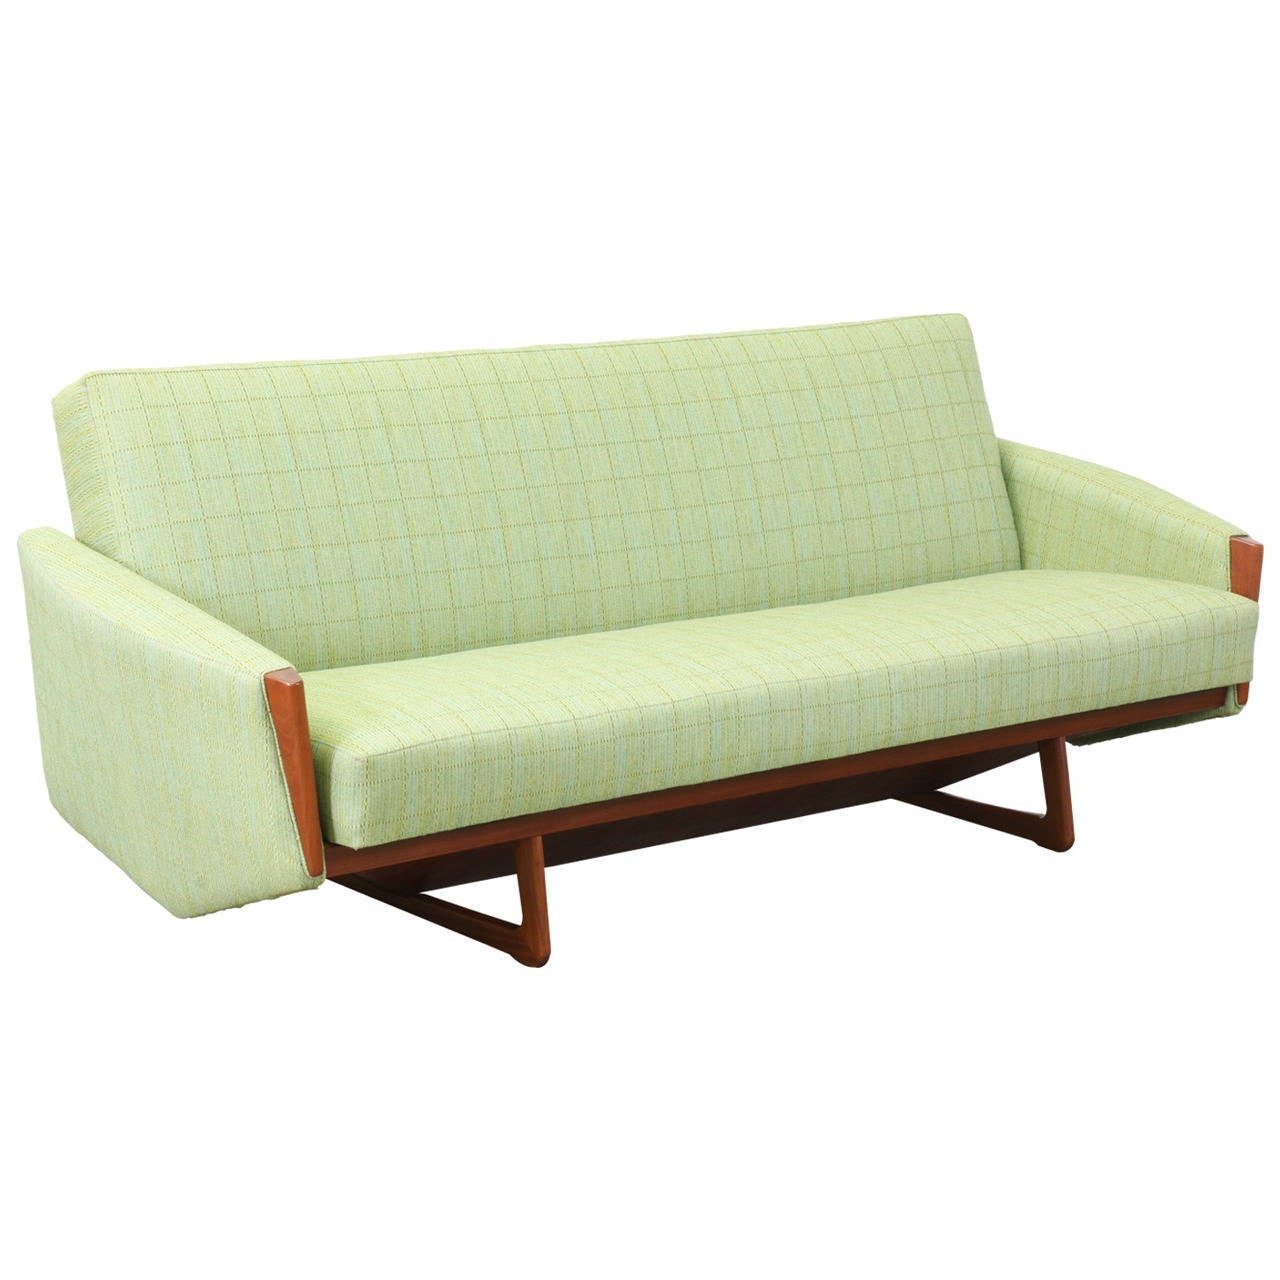 Danish Modern Teak Sofa Bed at 1stdibs